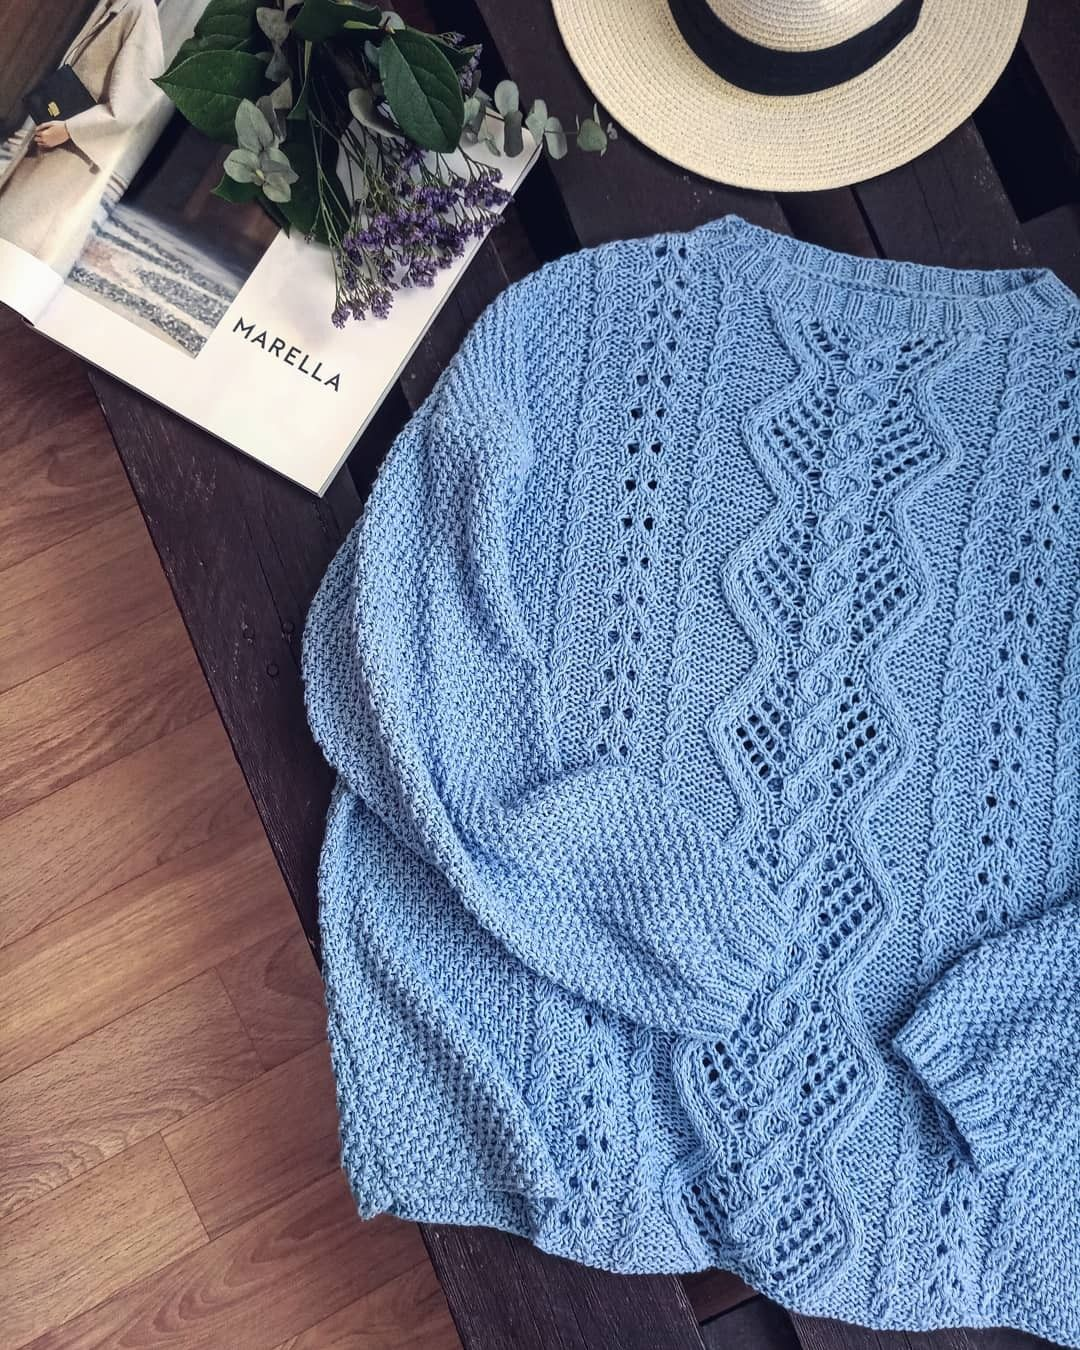 #sweater #oversize #knittingsweater #knit #style cotton #вязаныйсвитер #хлопковыйсвитер #джемпер